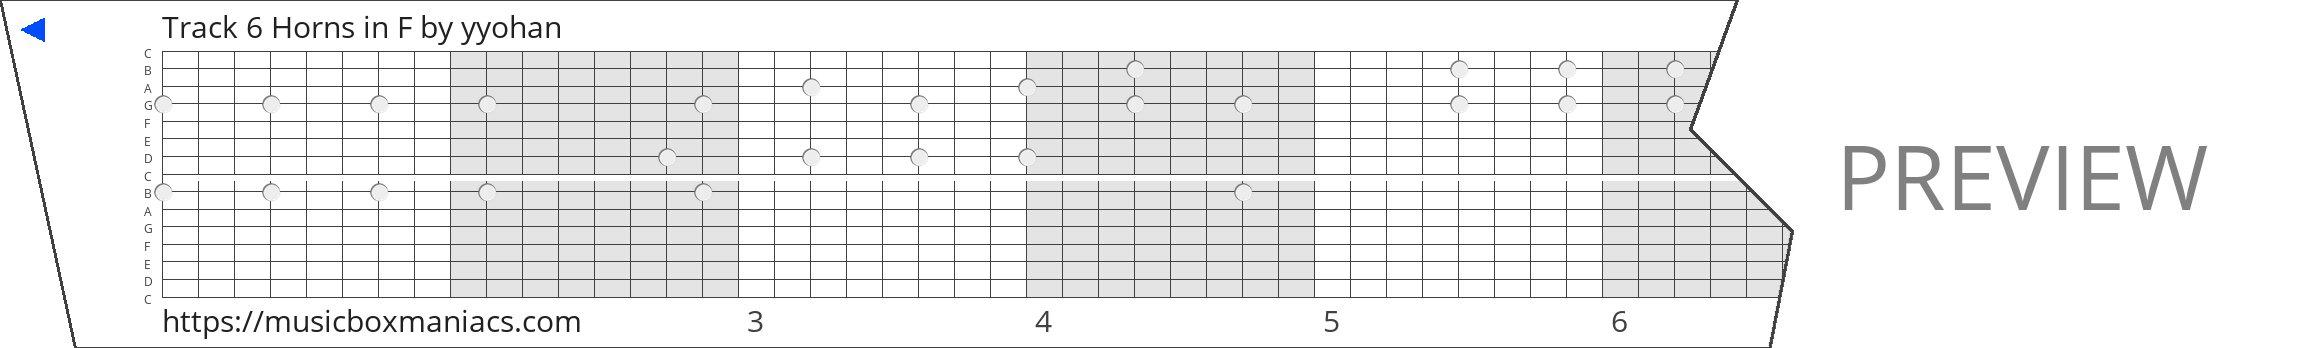 Track 6 Horns in F 15 note music box paper strip